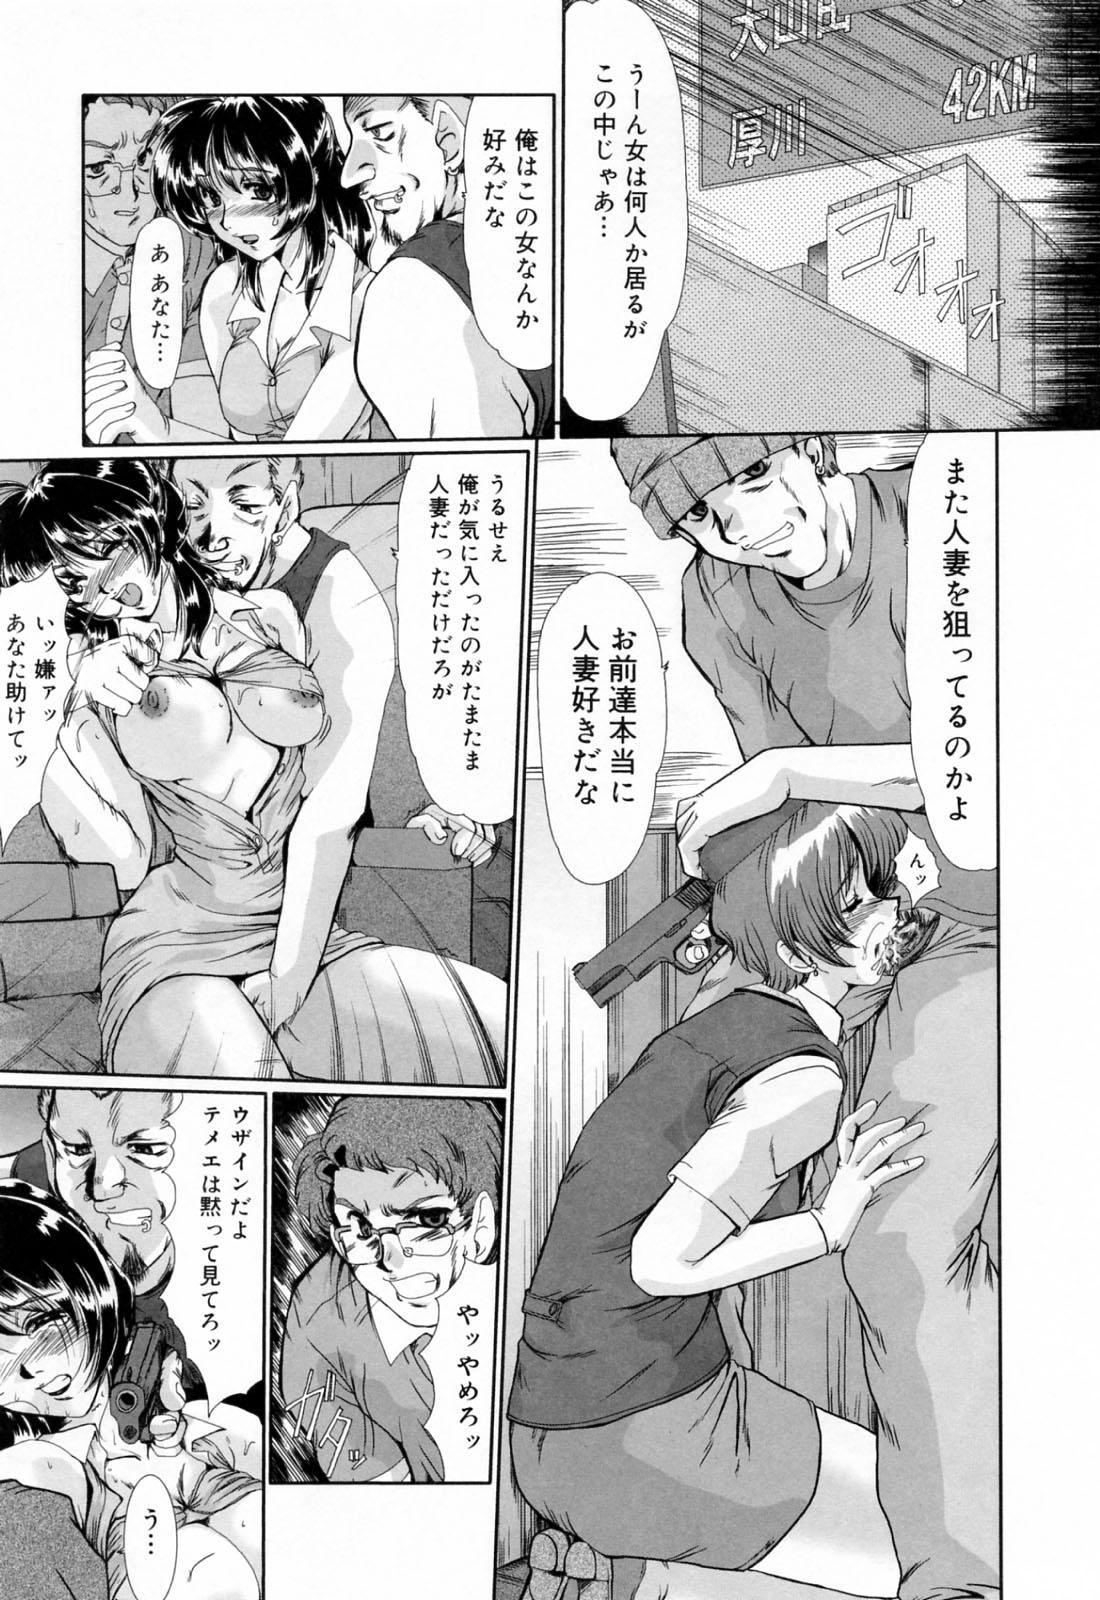 Kanjuku Hitozuma Nikki - The diary of the mature married woman 106